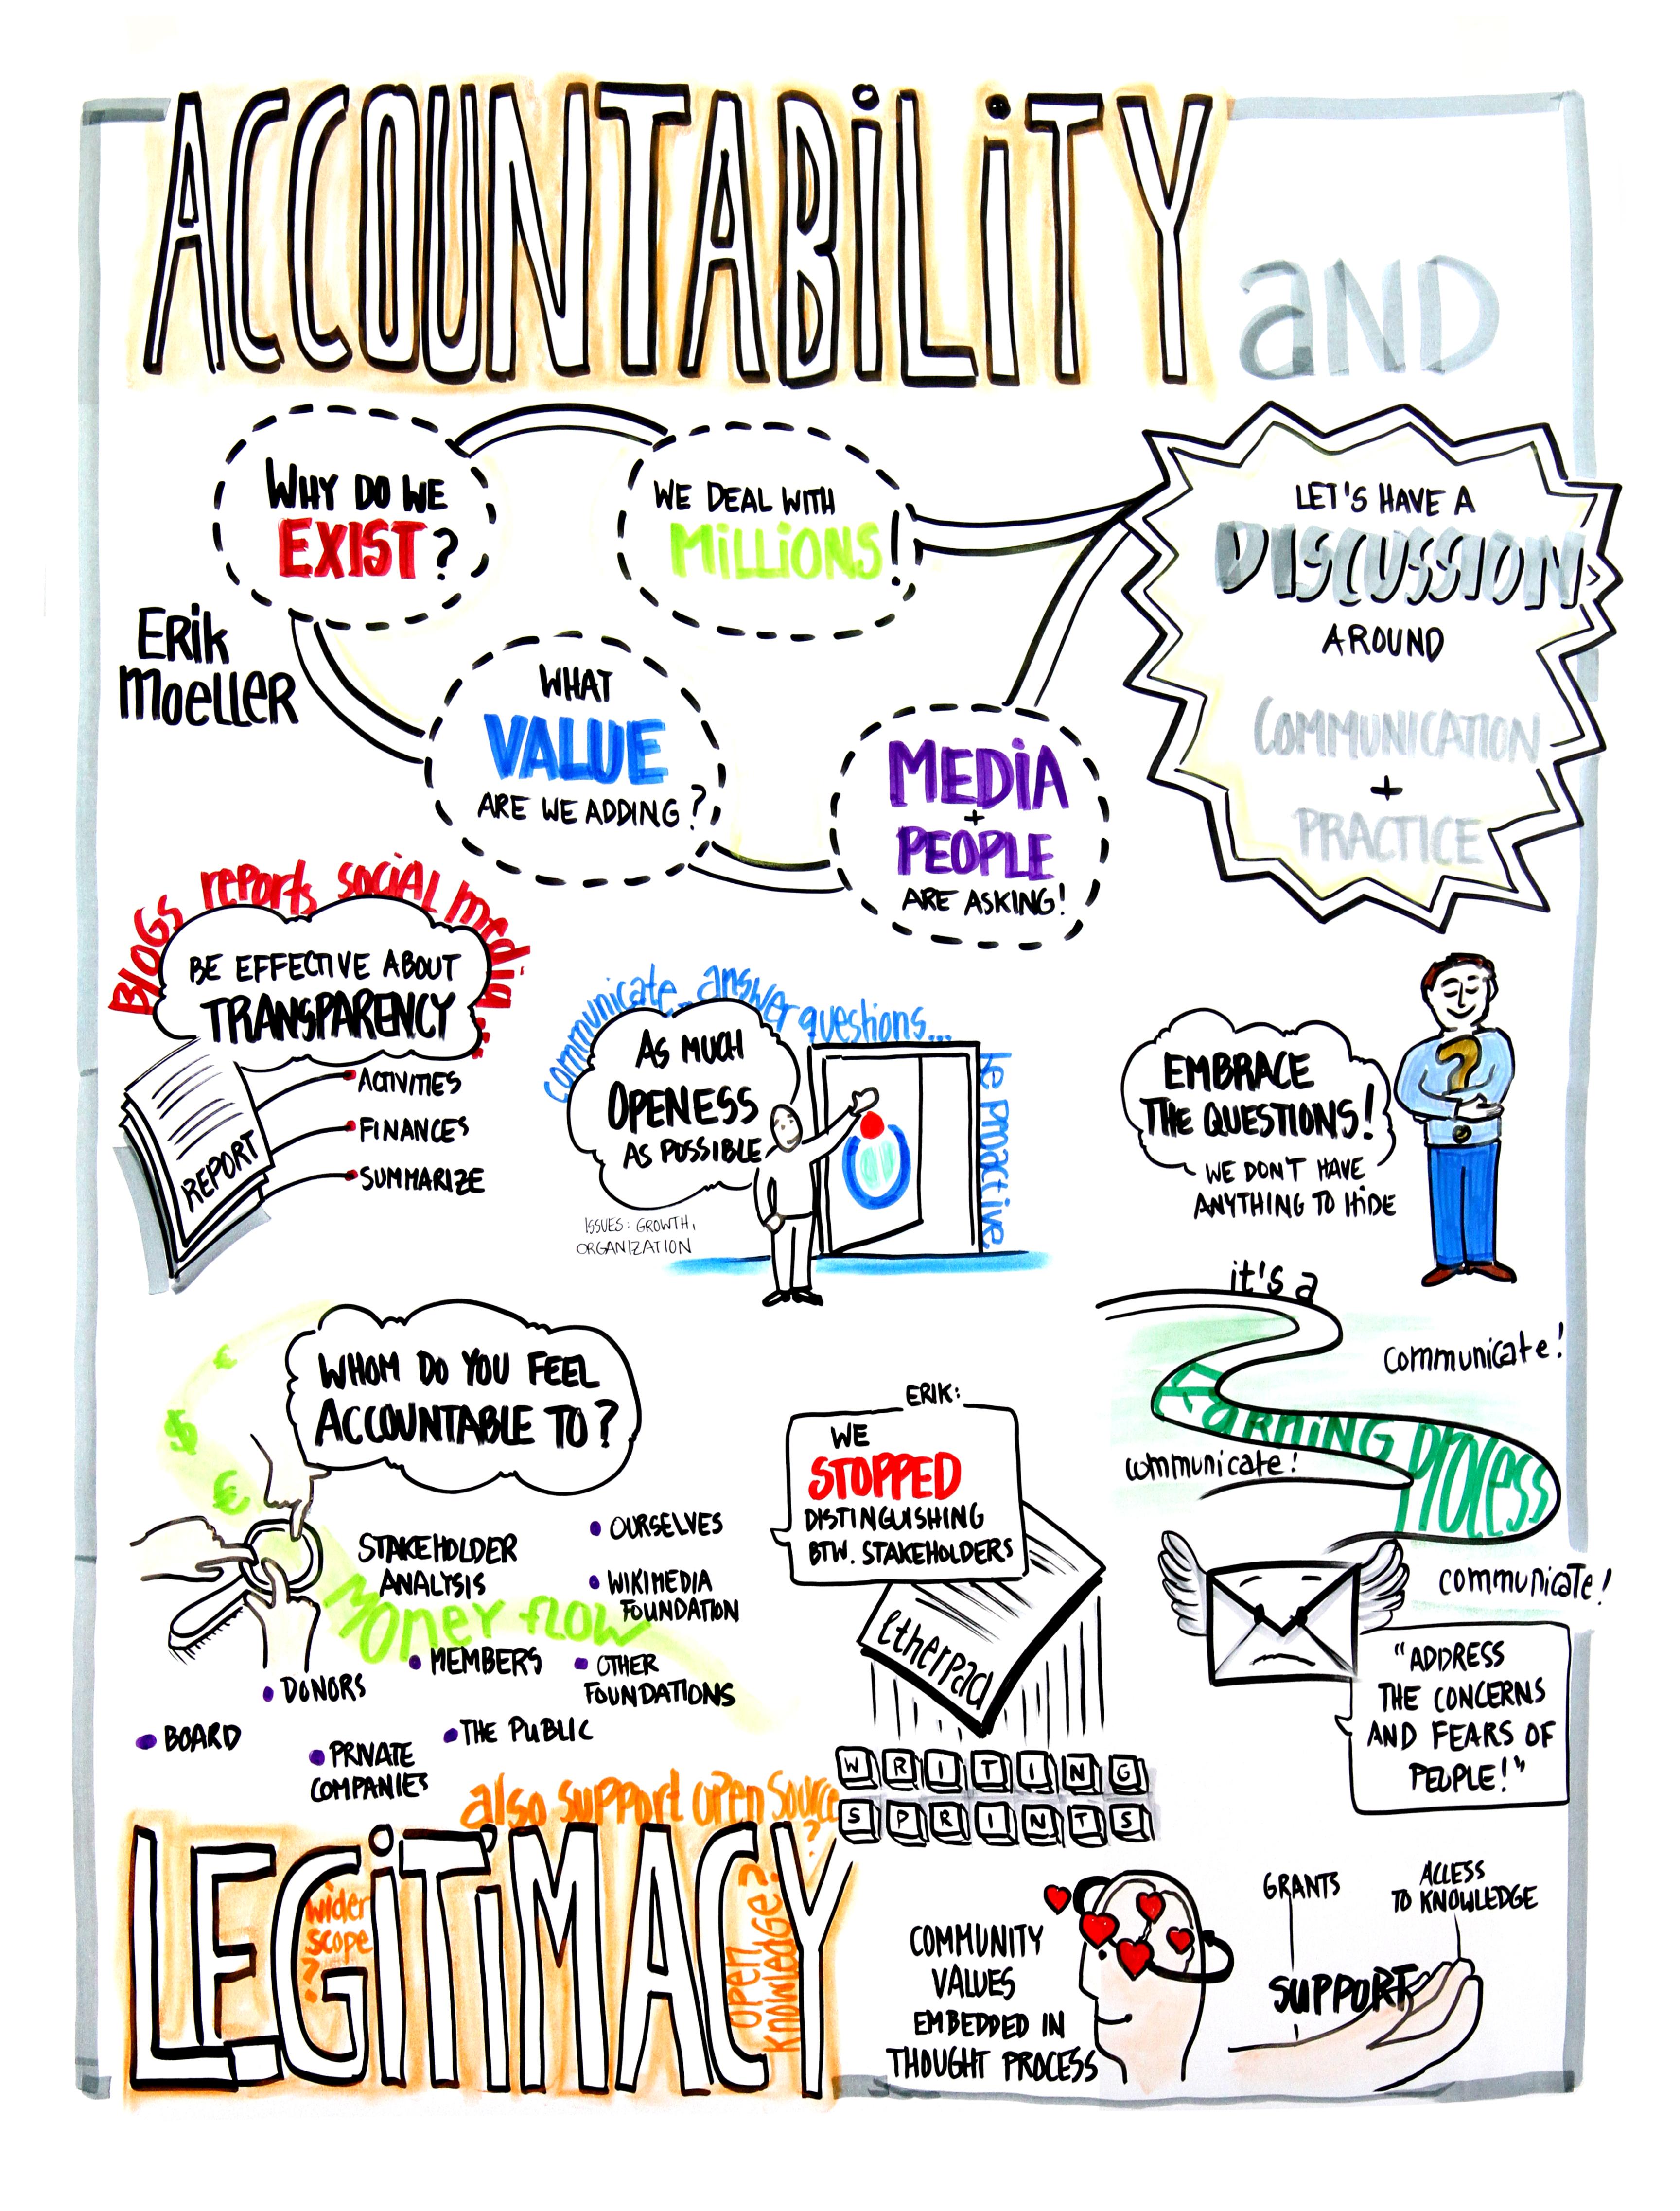 file accountability and legitimacy jpg wikimedia commons